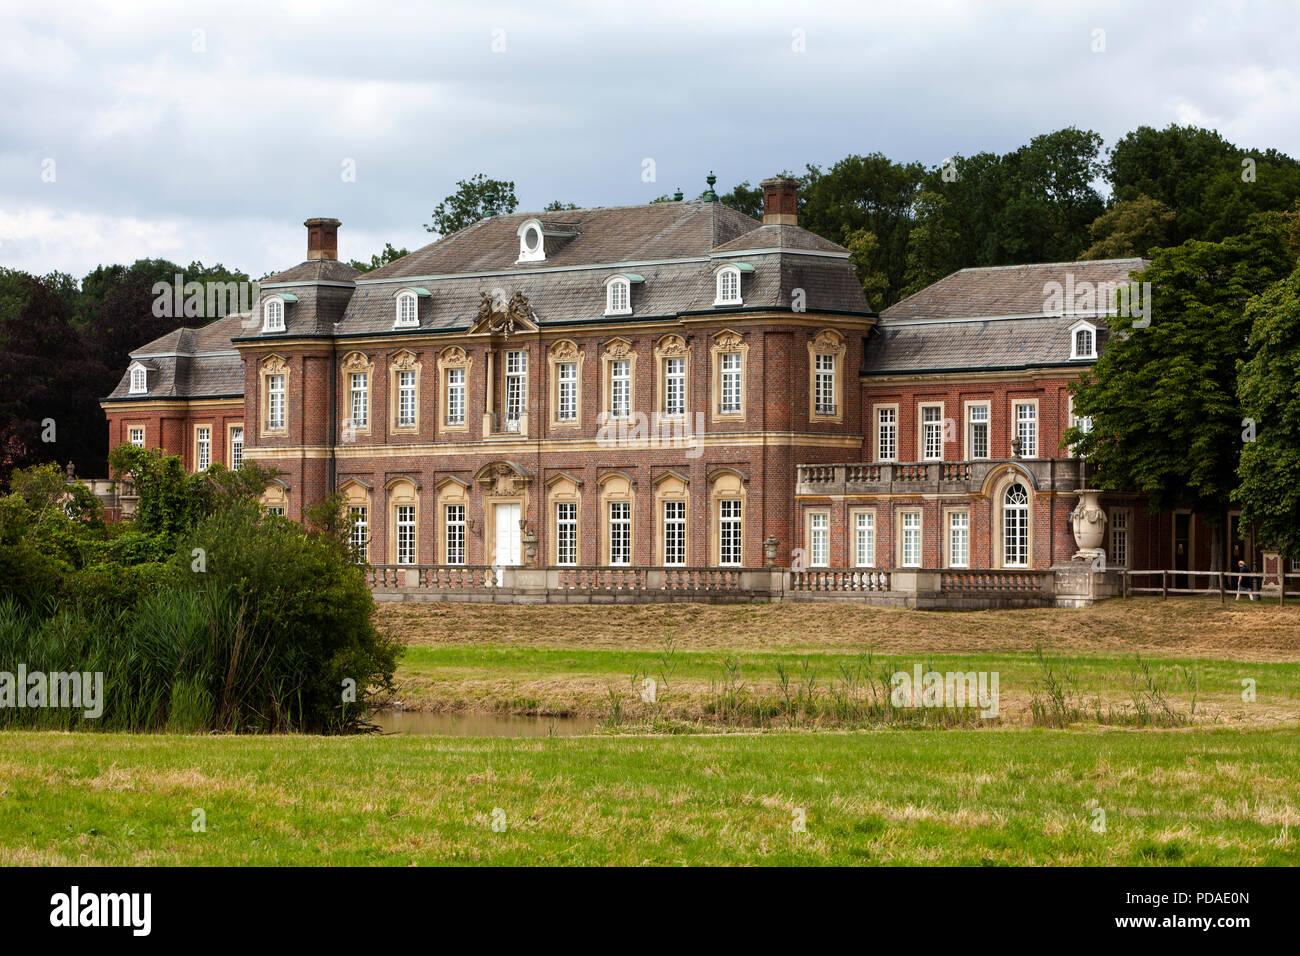 Oranienburg  Castle, Nordkirchen Moated Palace, Germany Stock Photo